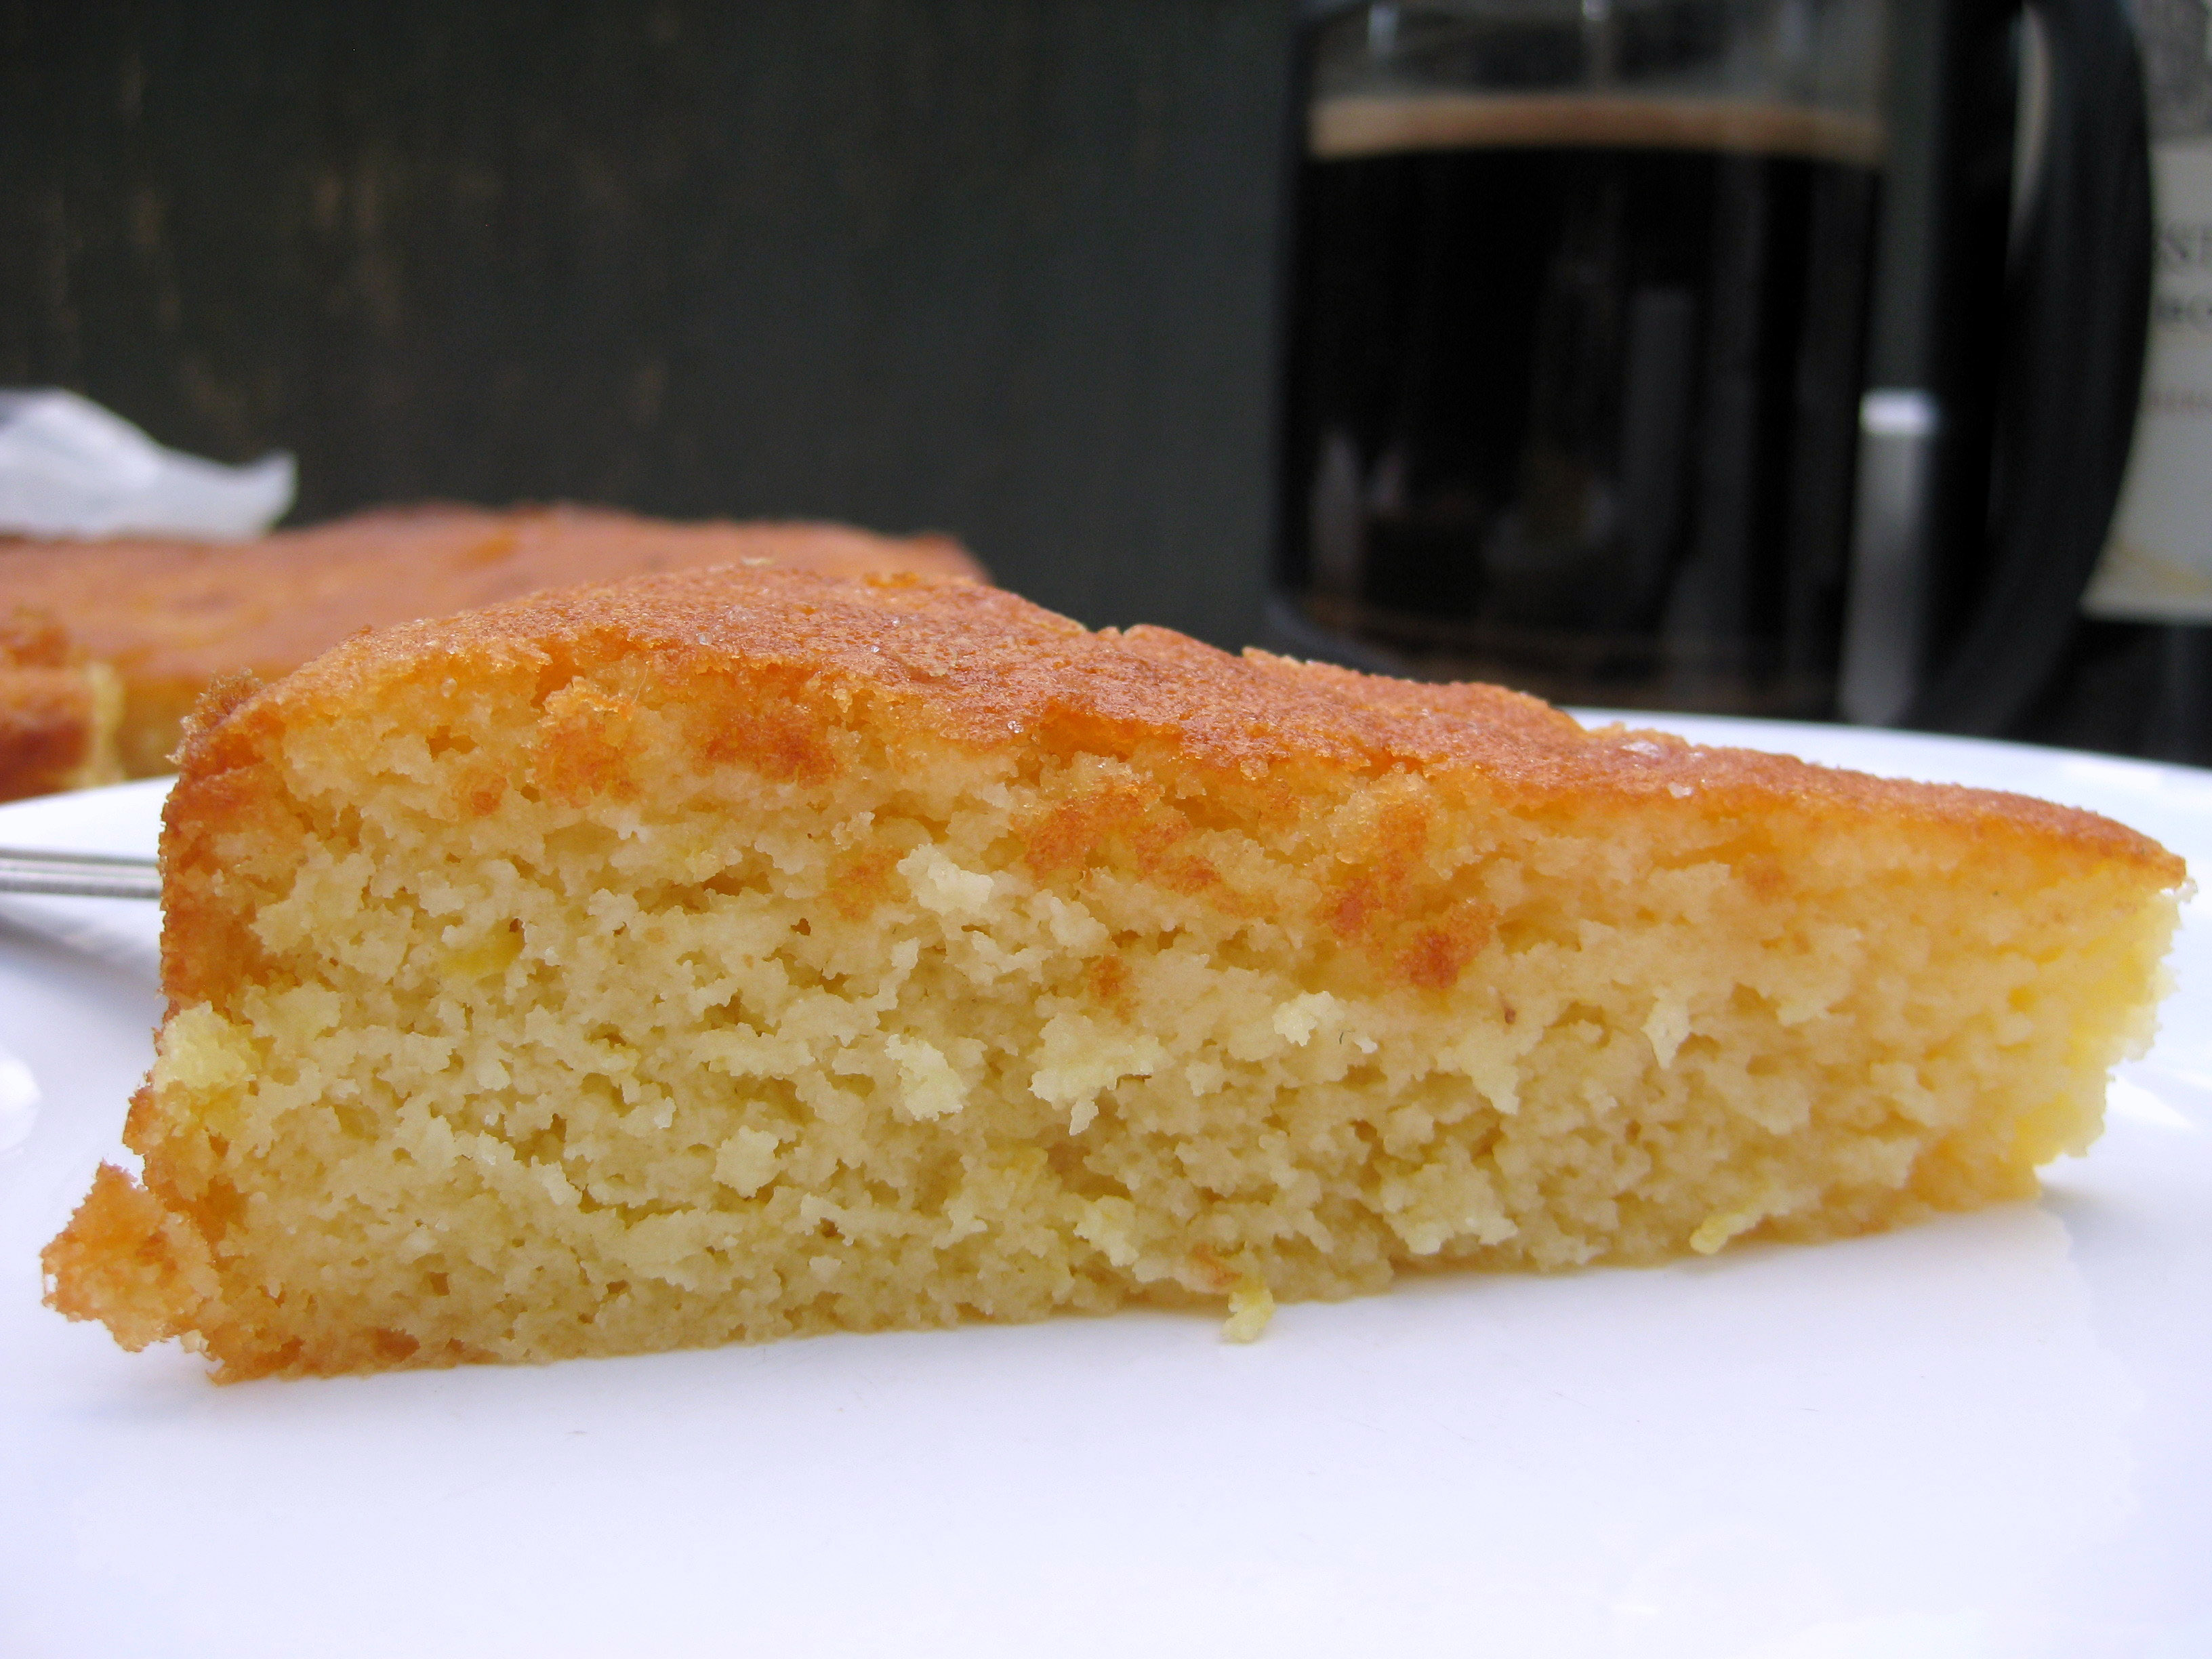 Big Gluten Free Cake London